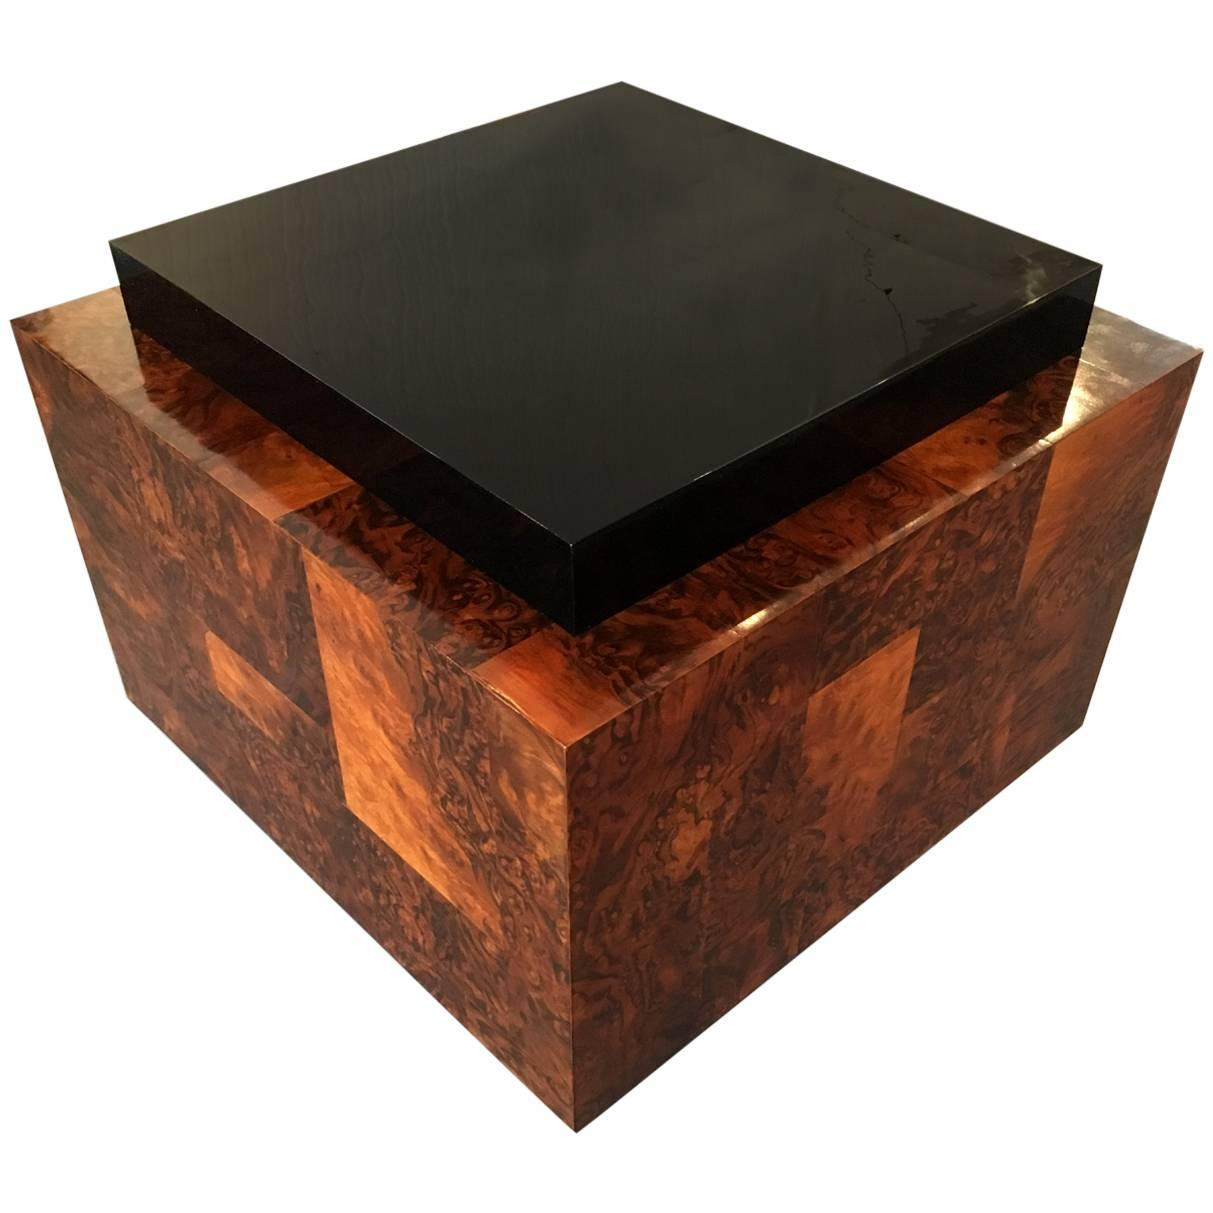 Burl Wood Patchwork Table by Paul Evans